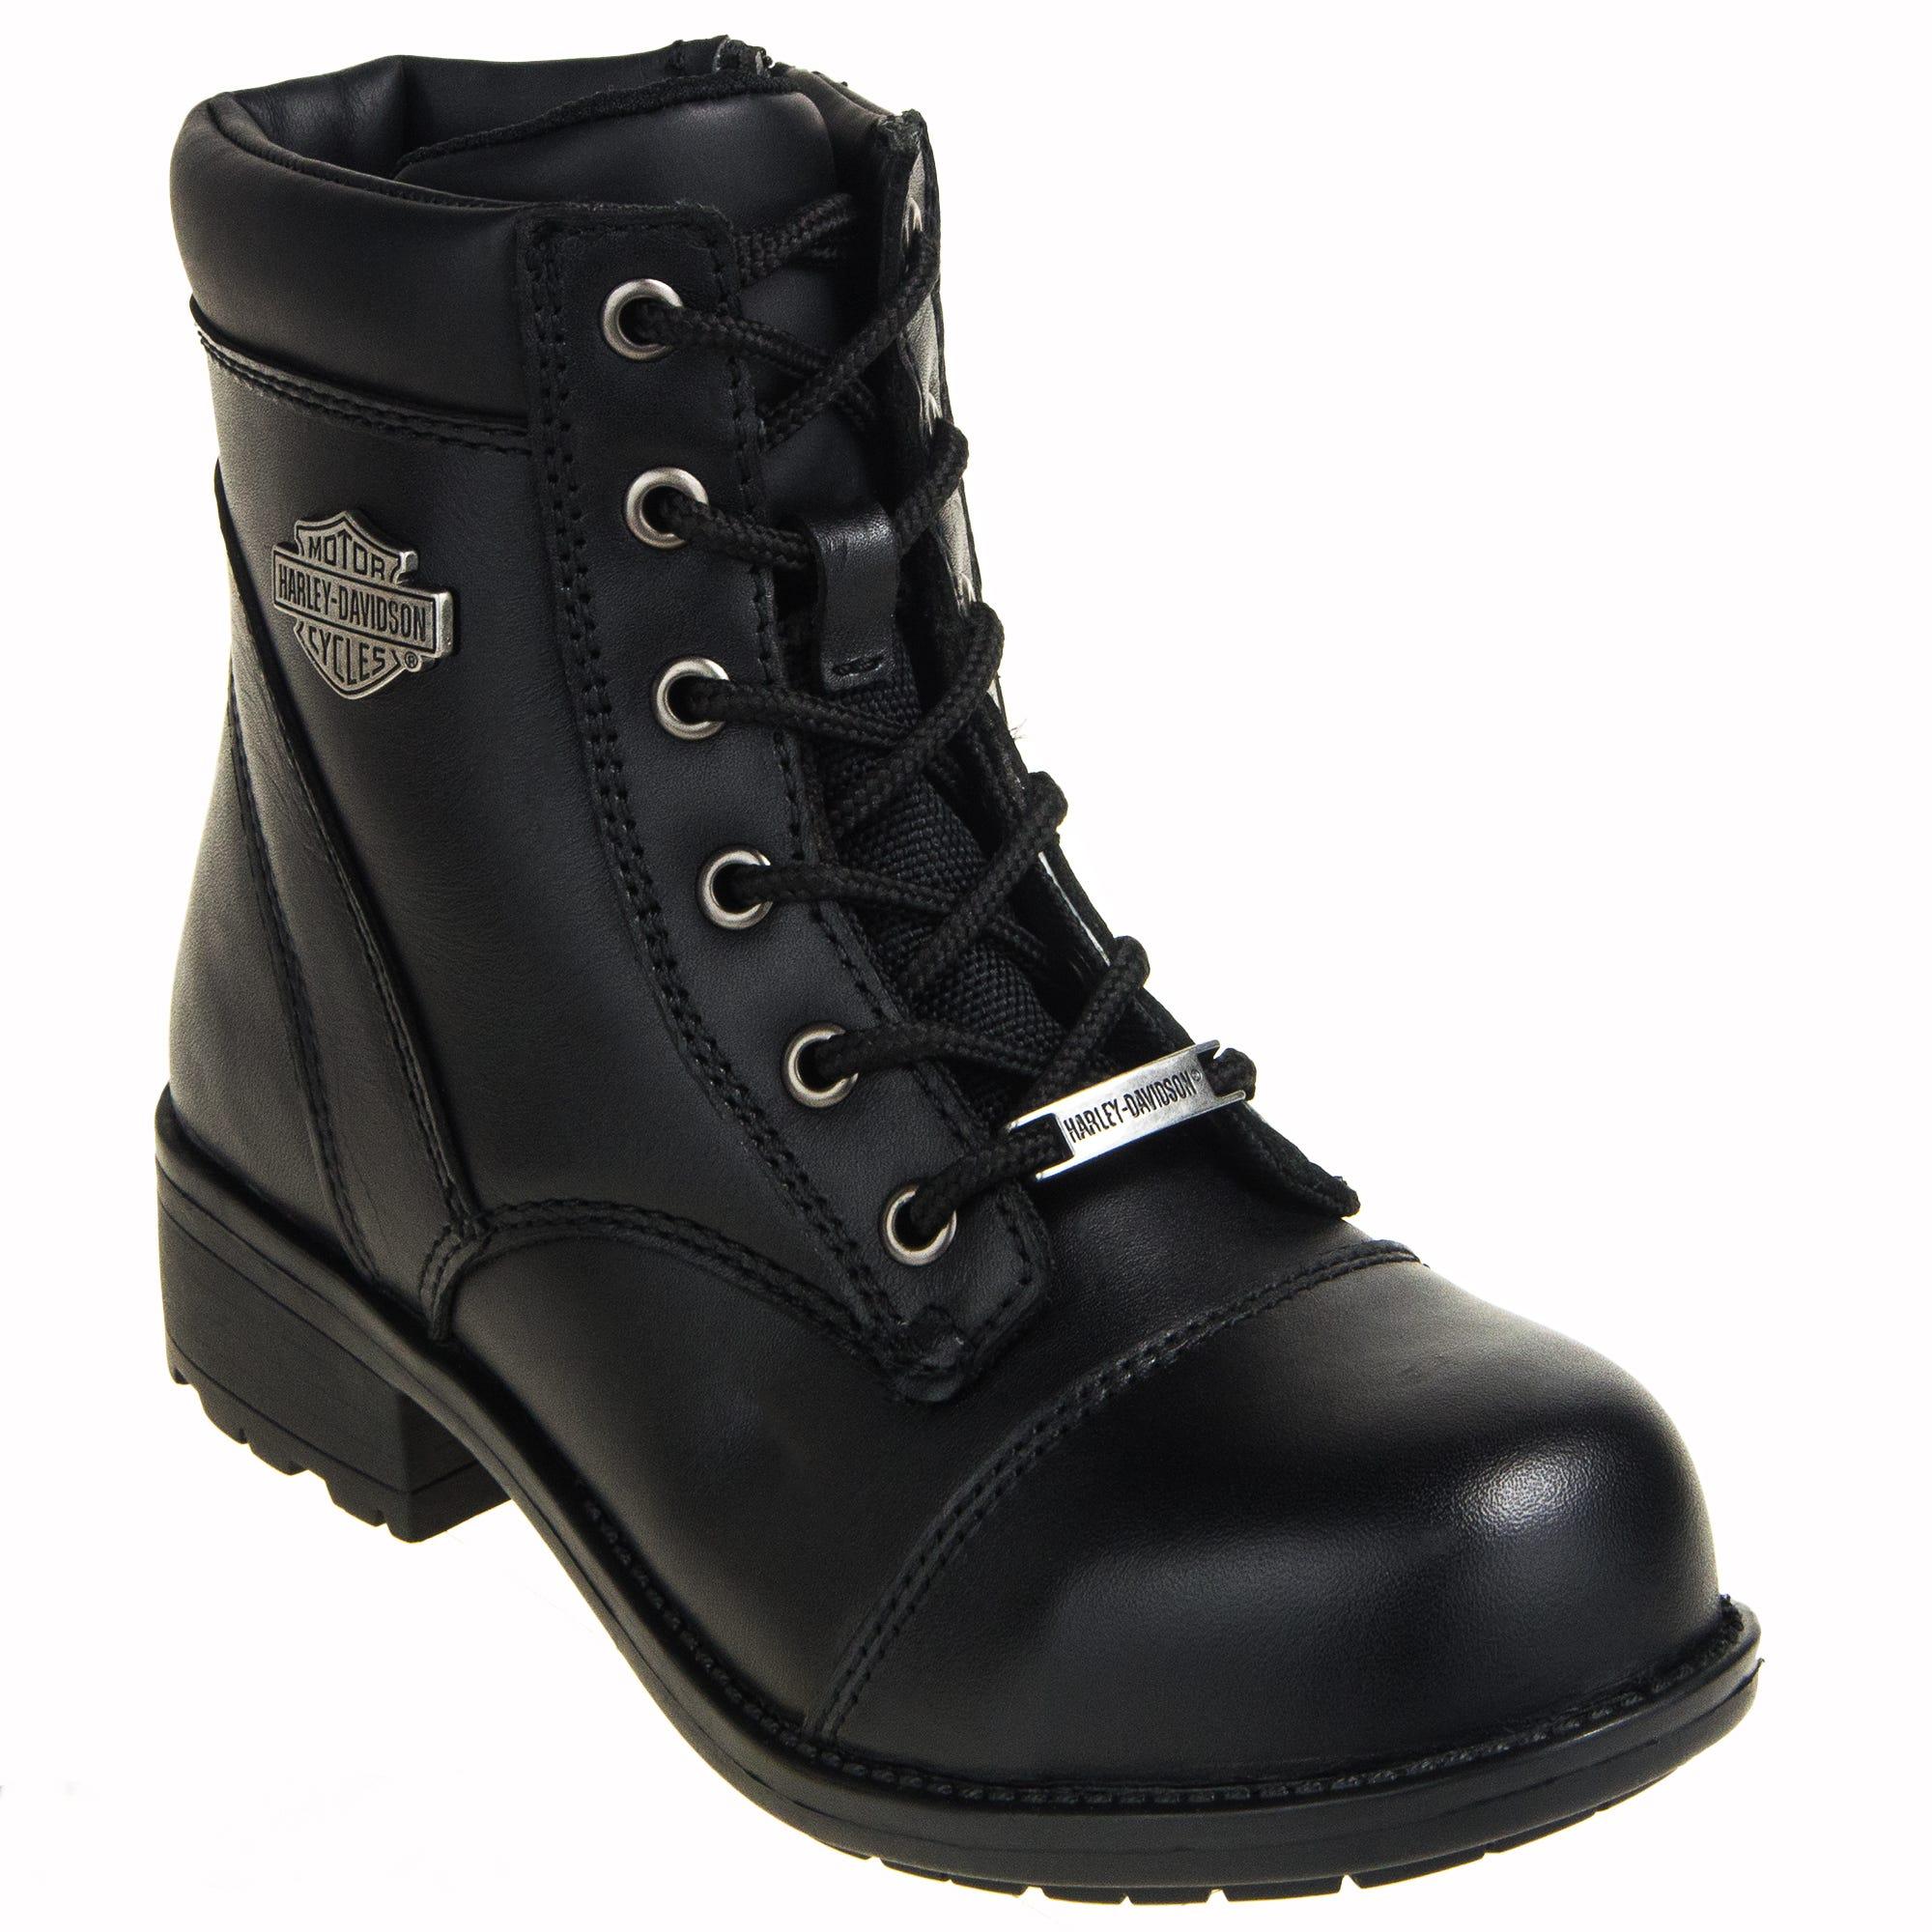 Harley Davidson Women's Steel Toe Black 83883 Raine Work Boots